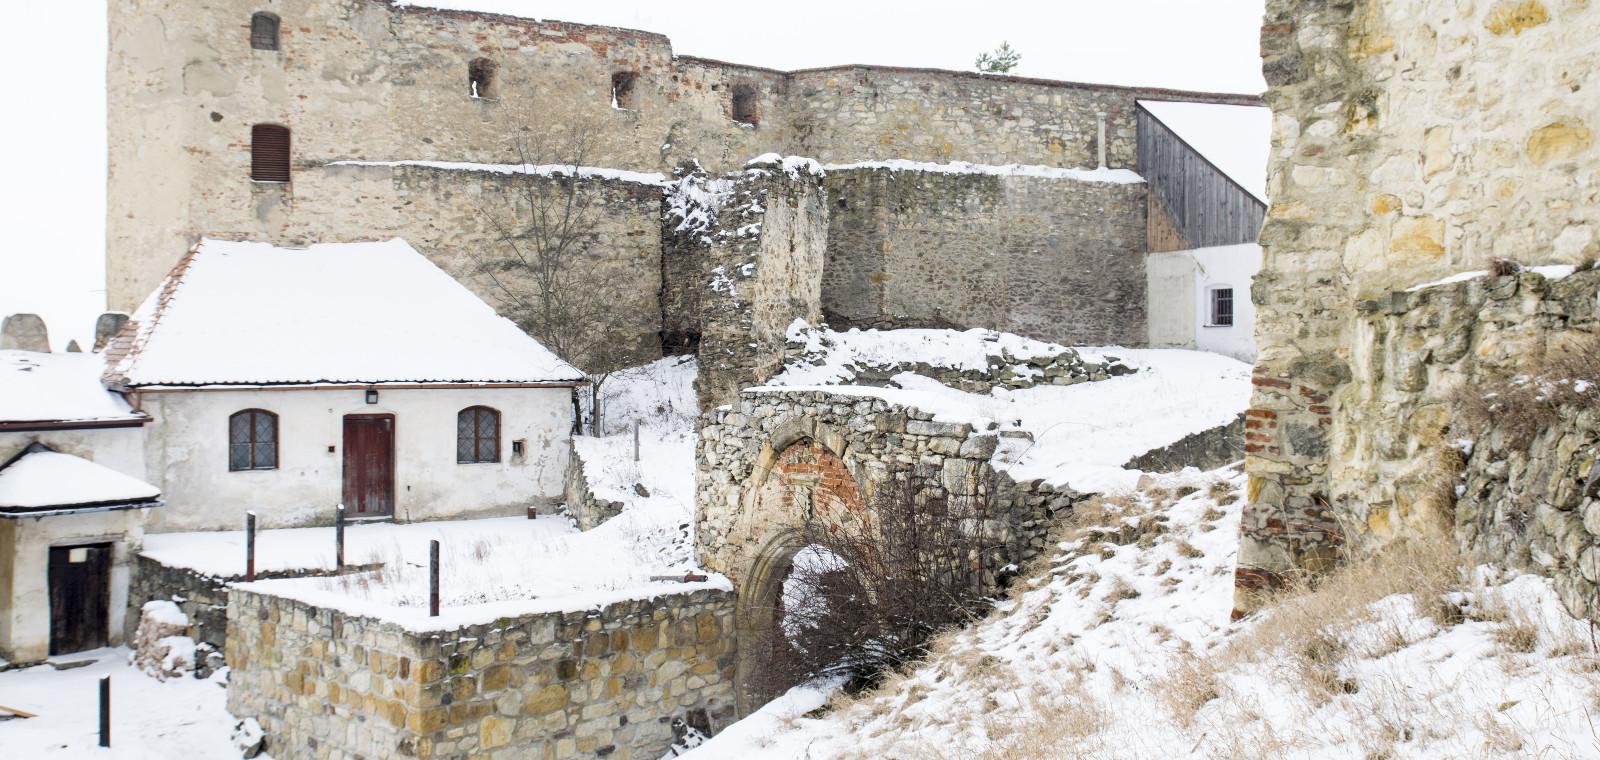 boskovice-hrad-teaser-02.jpg